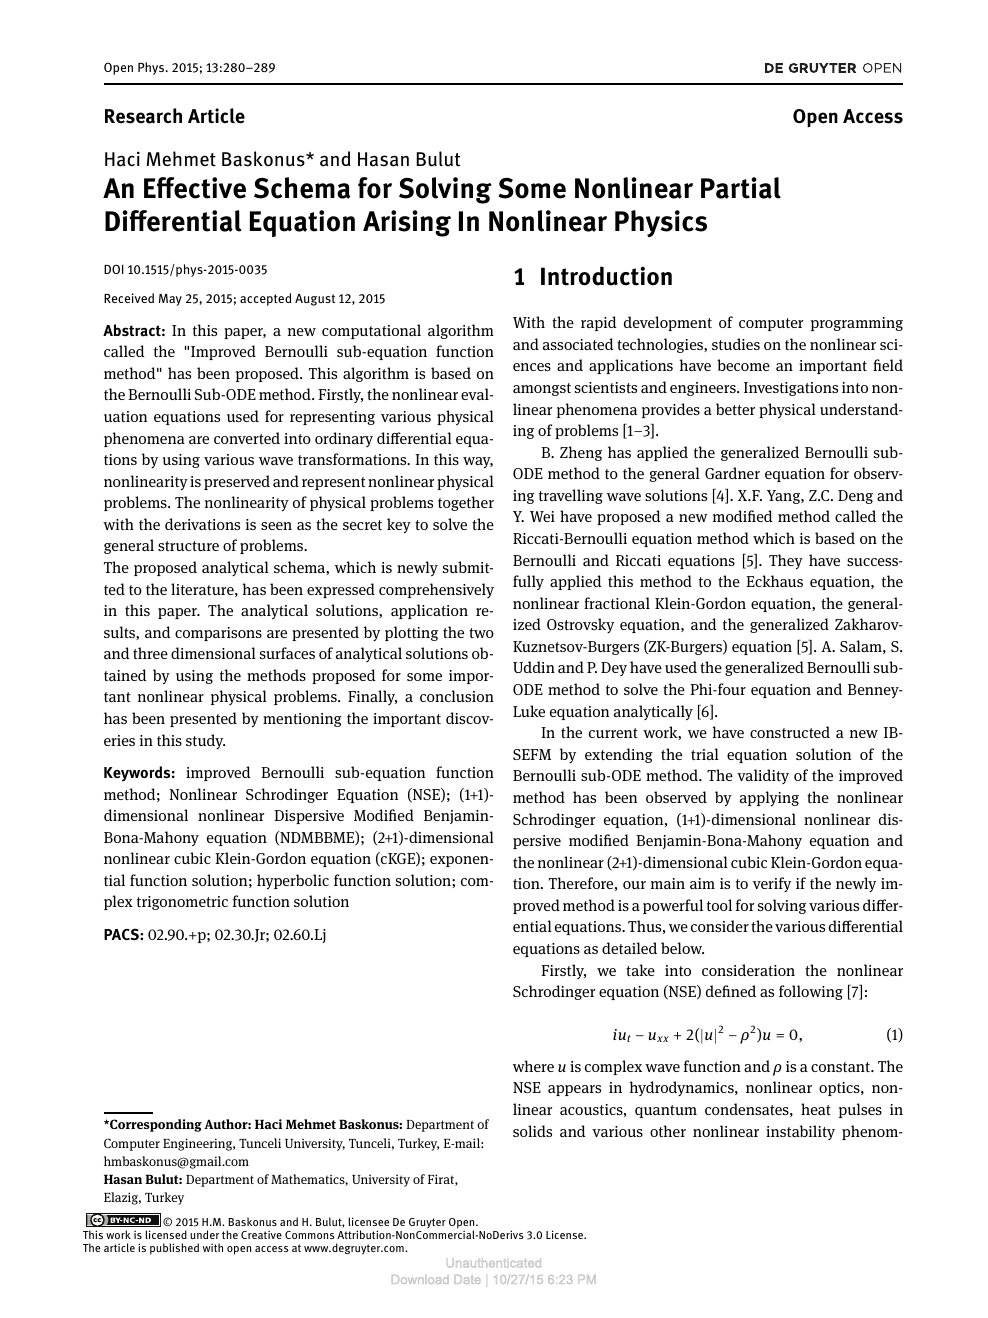 An Effective Schema for Solving Some Nonlinear Partial